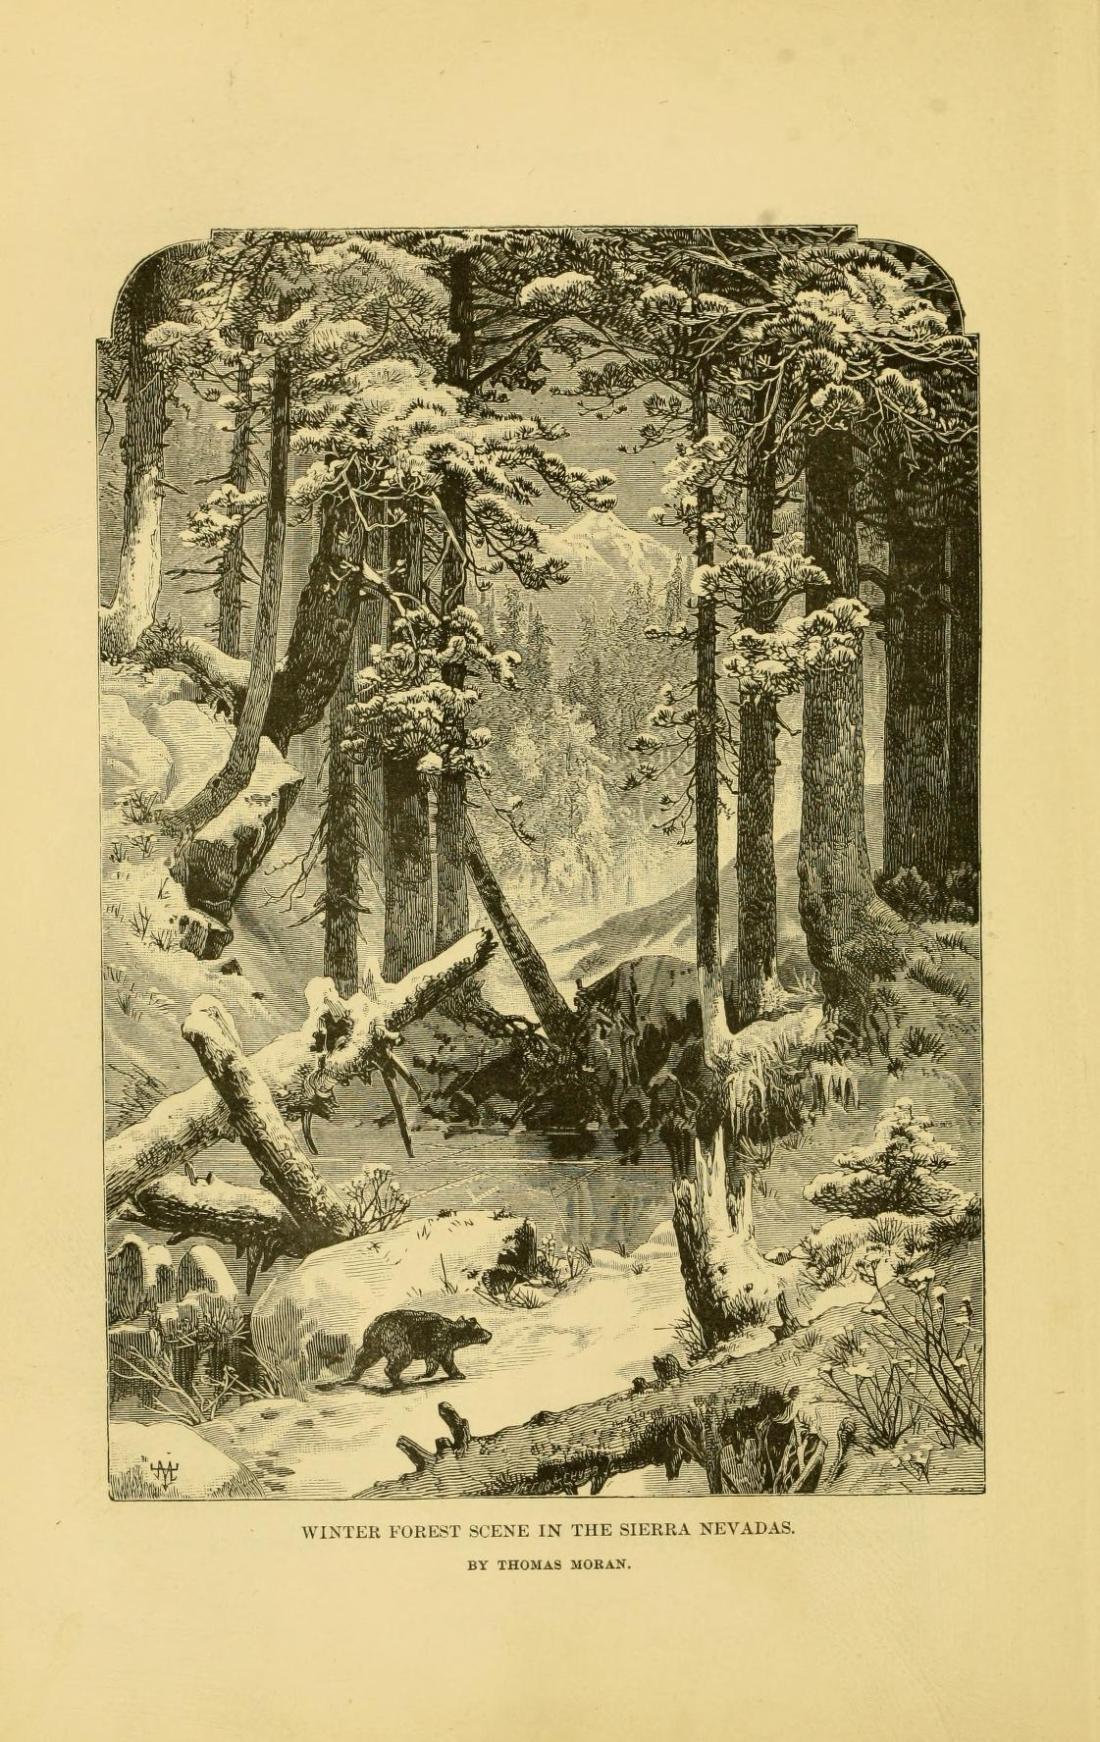 """Winter Forest Scene in the Sierra Nevadas."" Thomas Moran, artist."